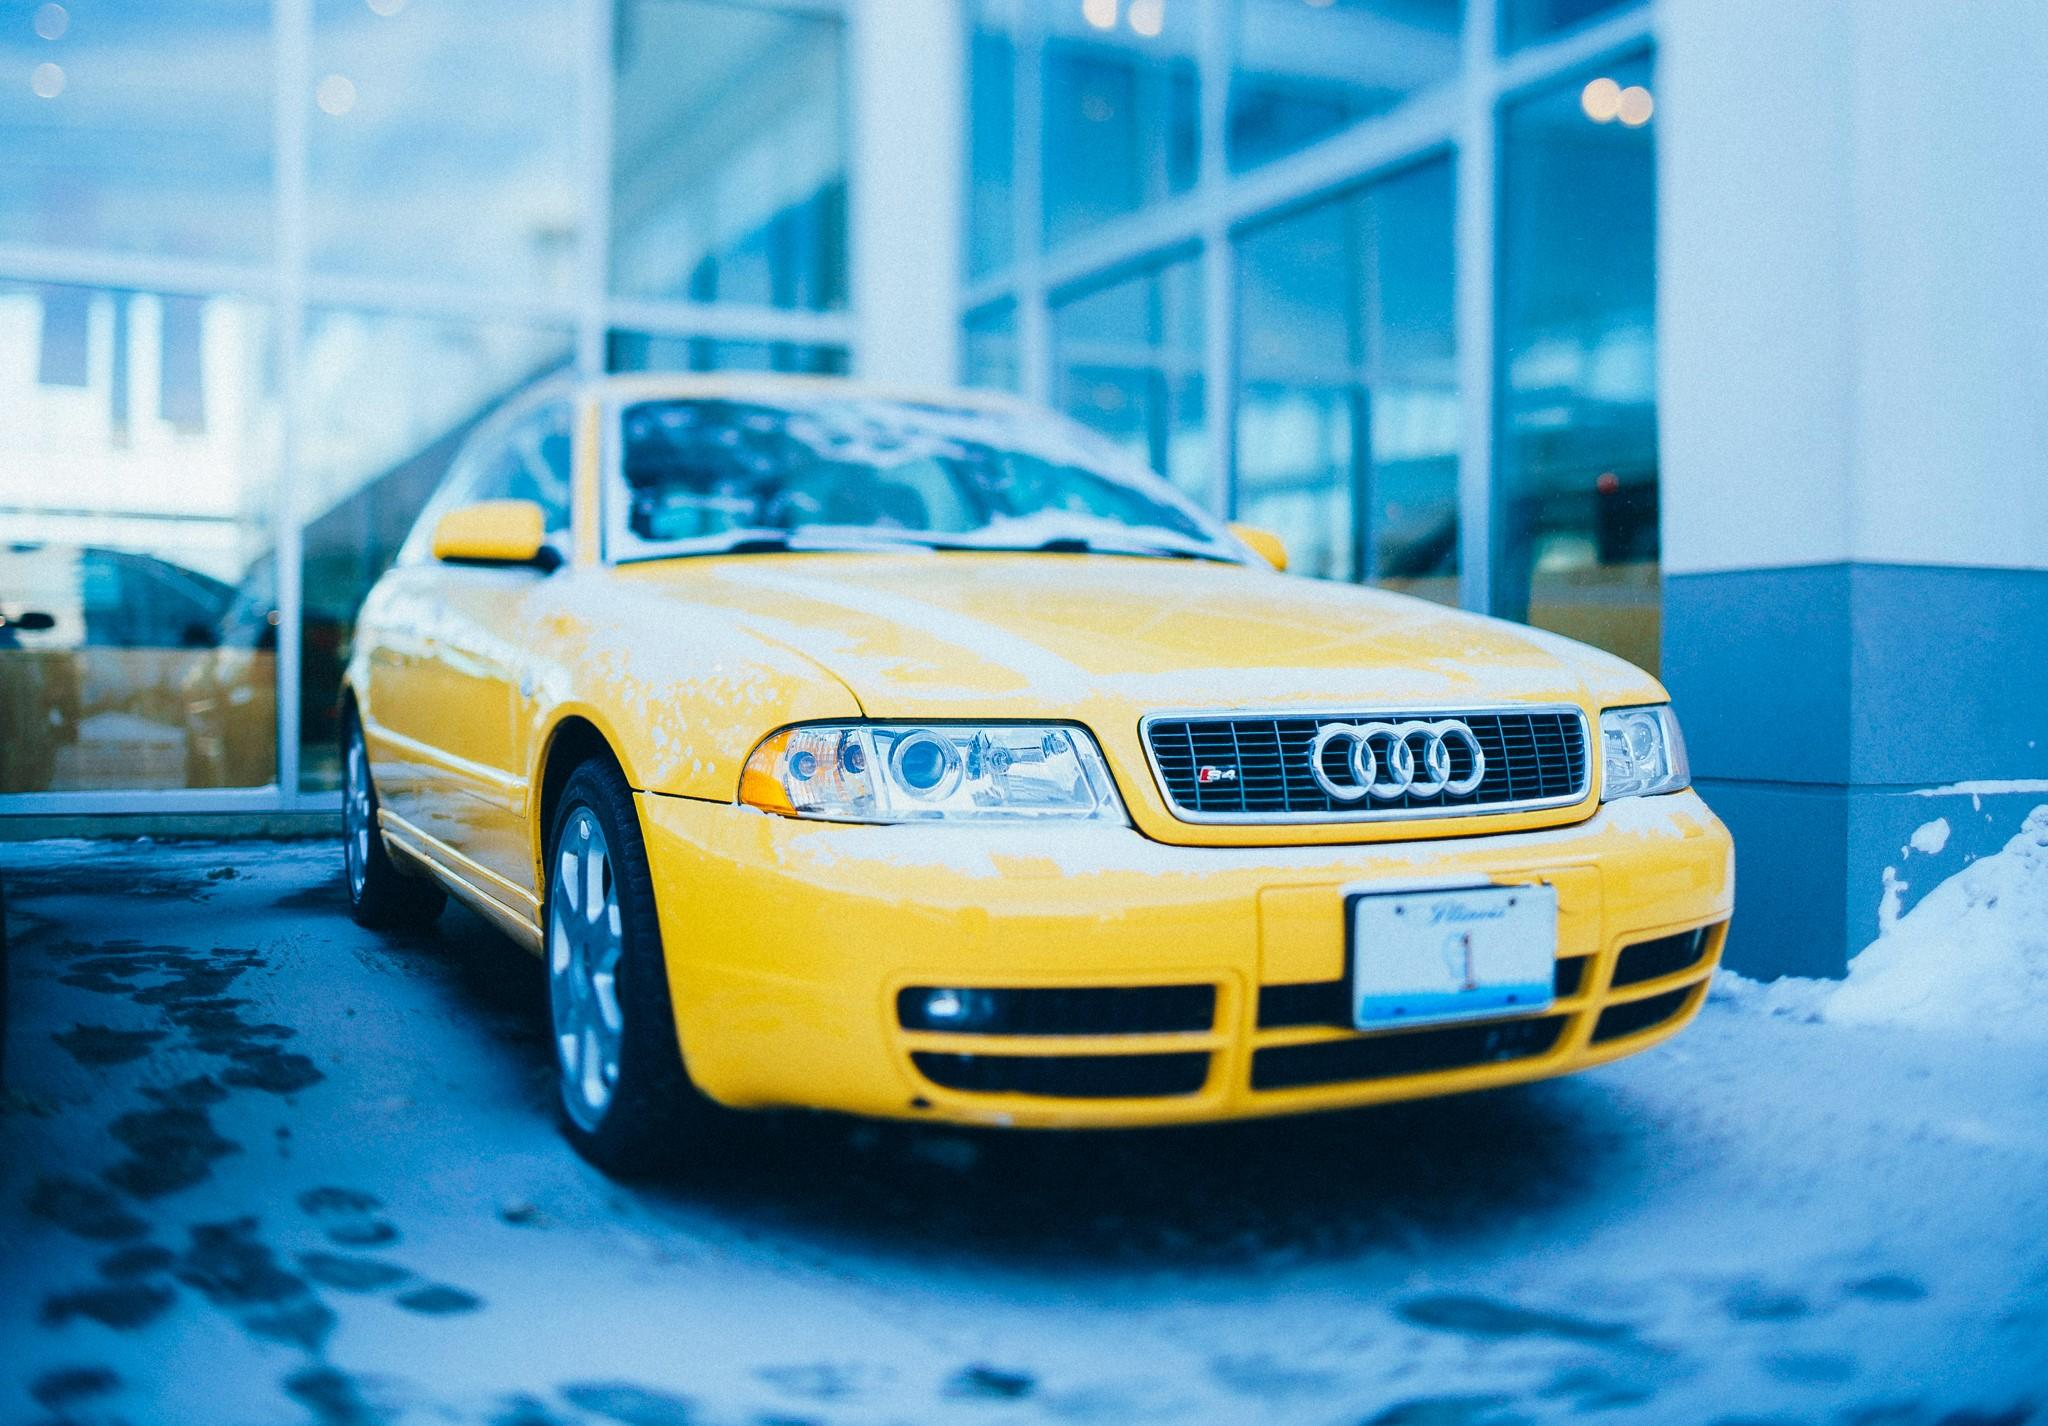 Audi exchange service coupons